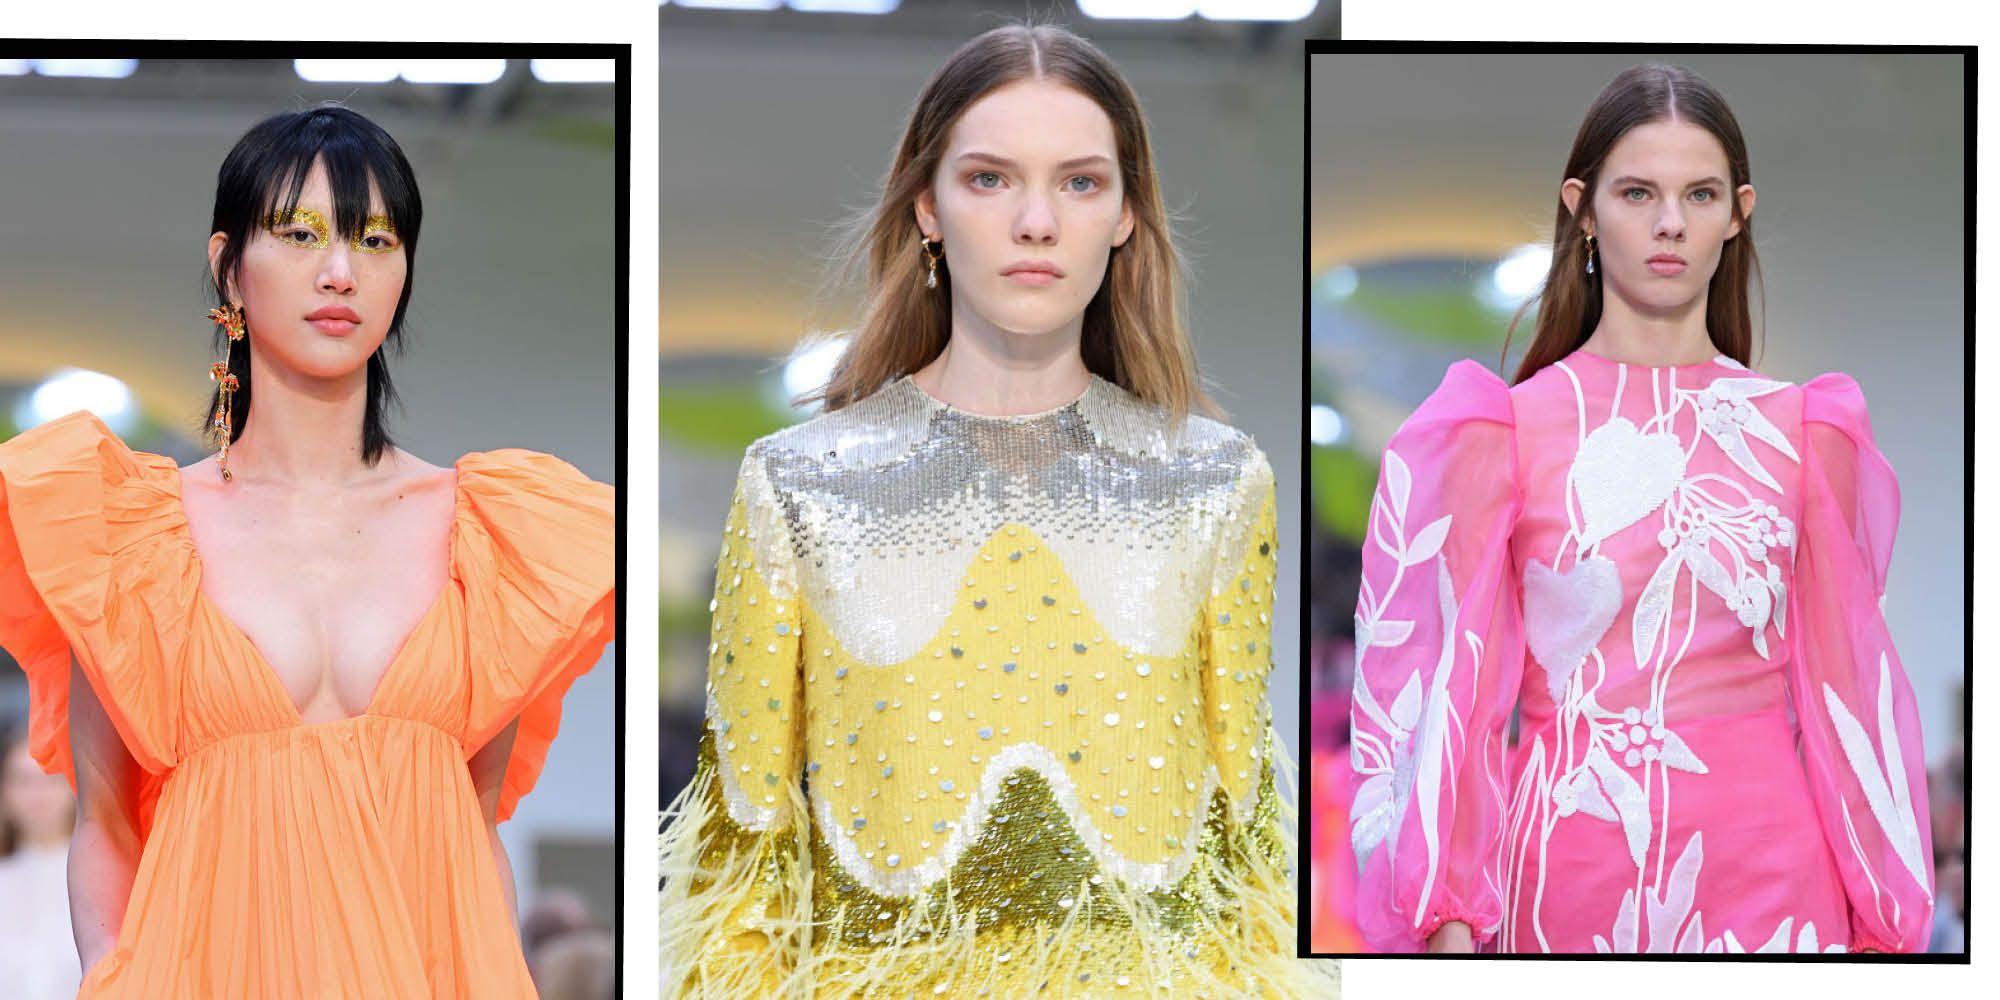 Valentino's Pierpaolo Piccioli Brings Fun And Flounce Back To Eveningwear